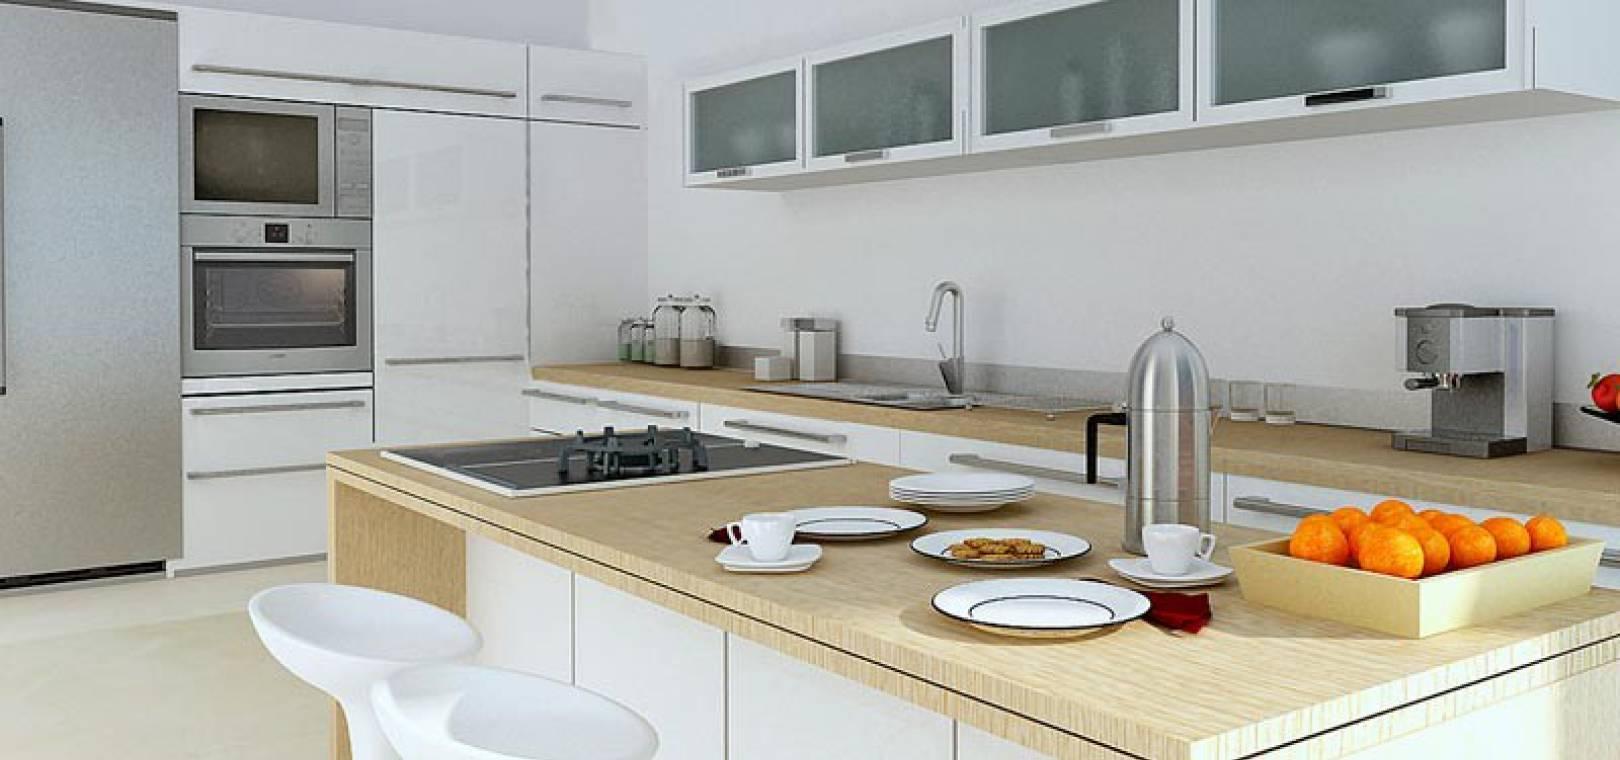 to buy,villas,modern,guardamar hills,guardamar,costa,blanca,op16-kitchen